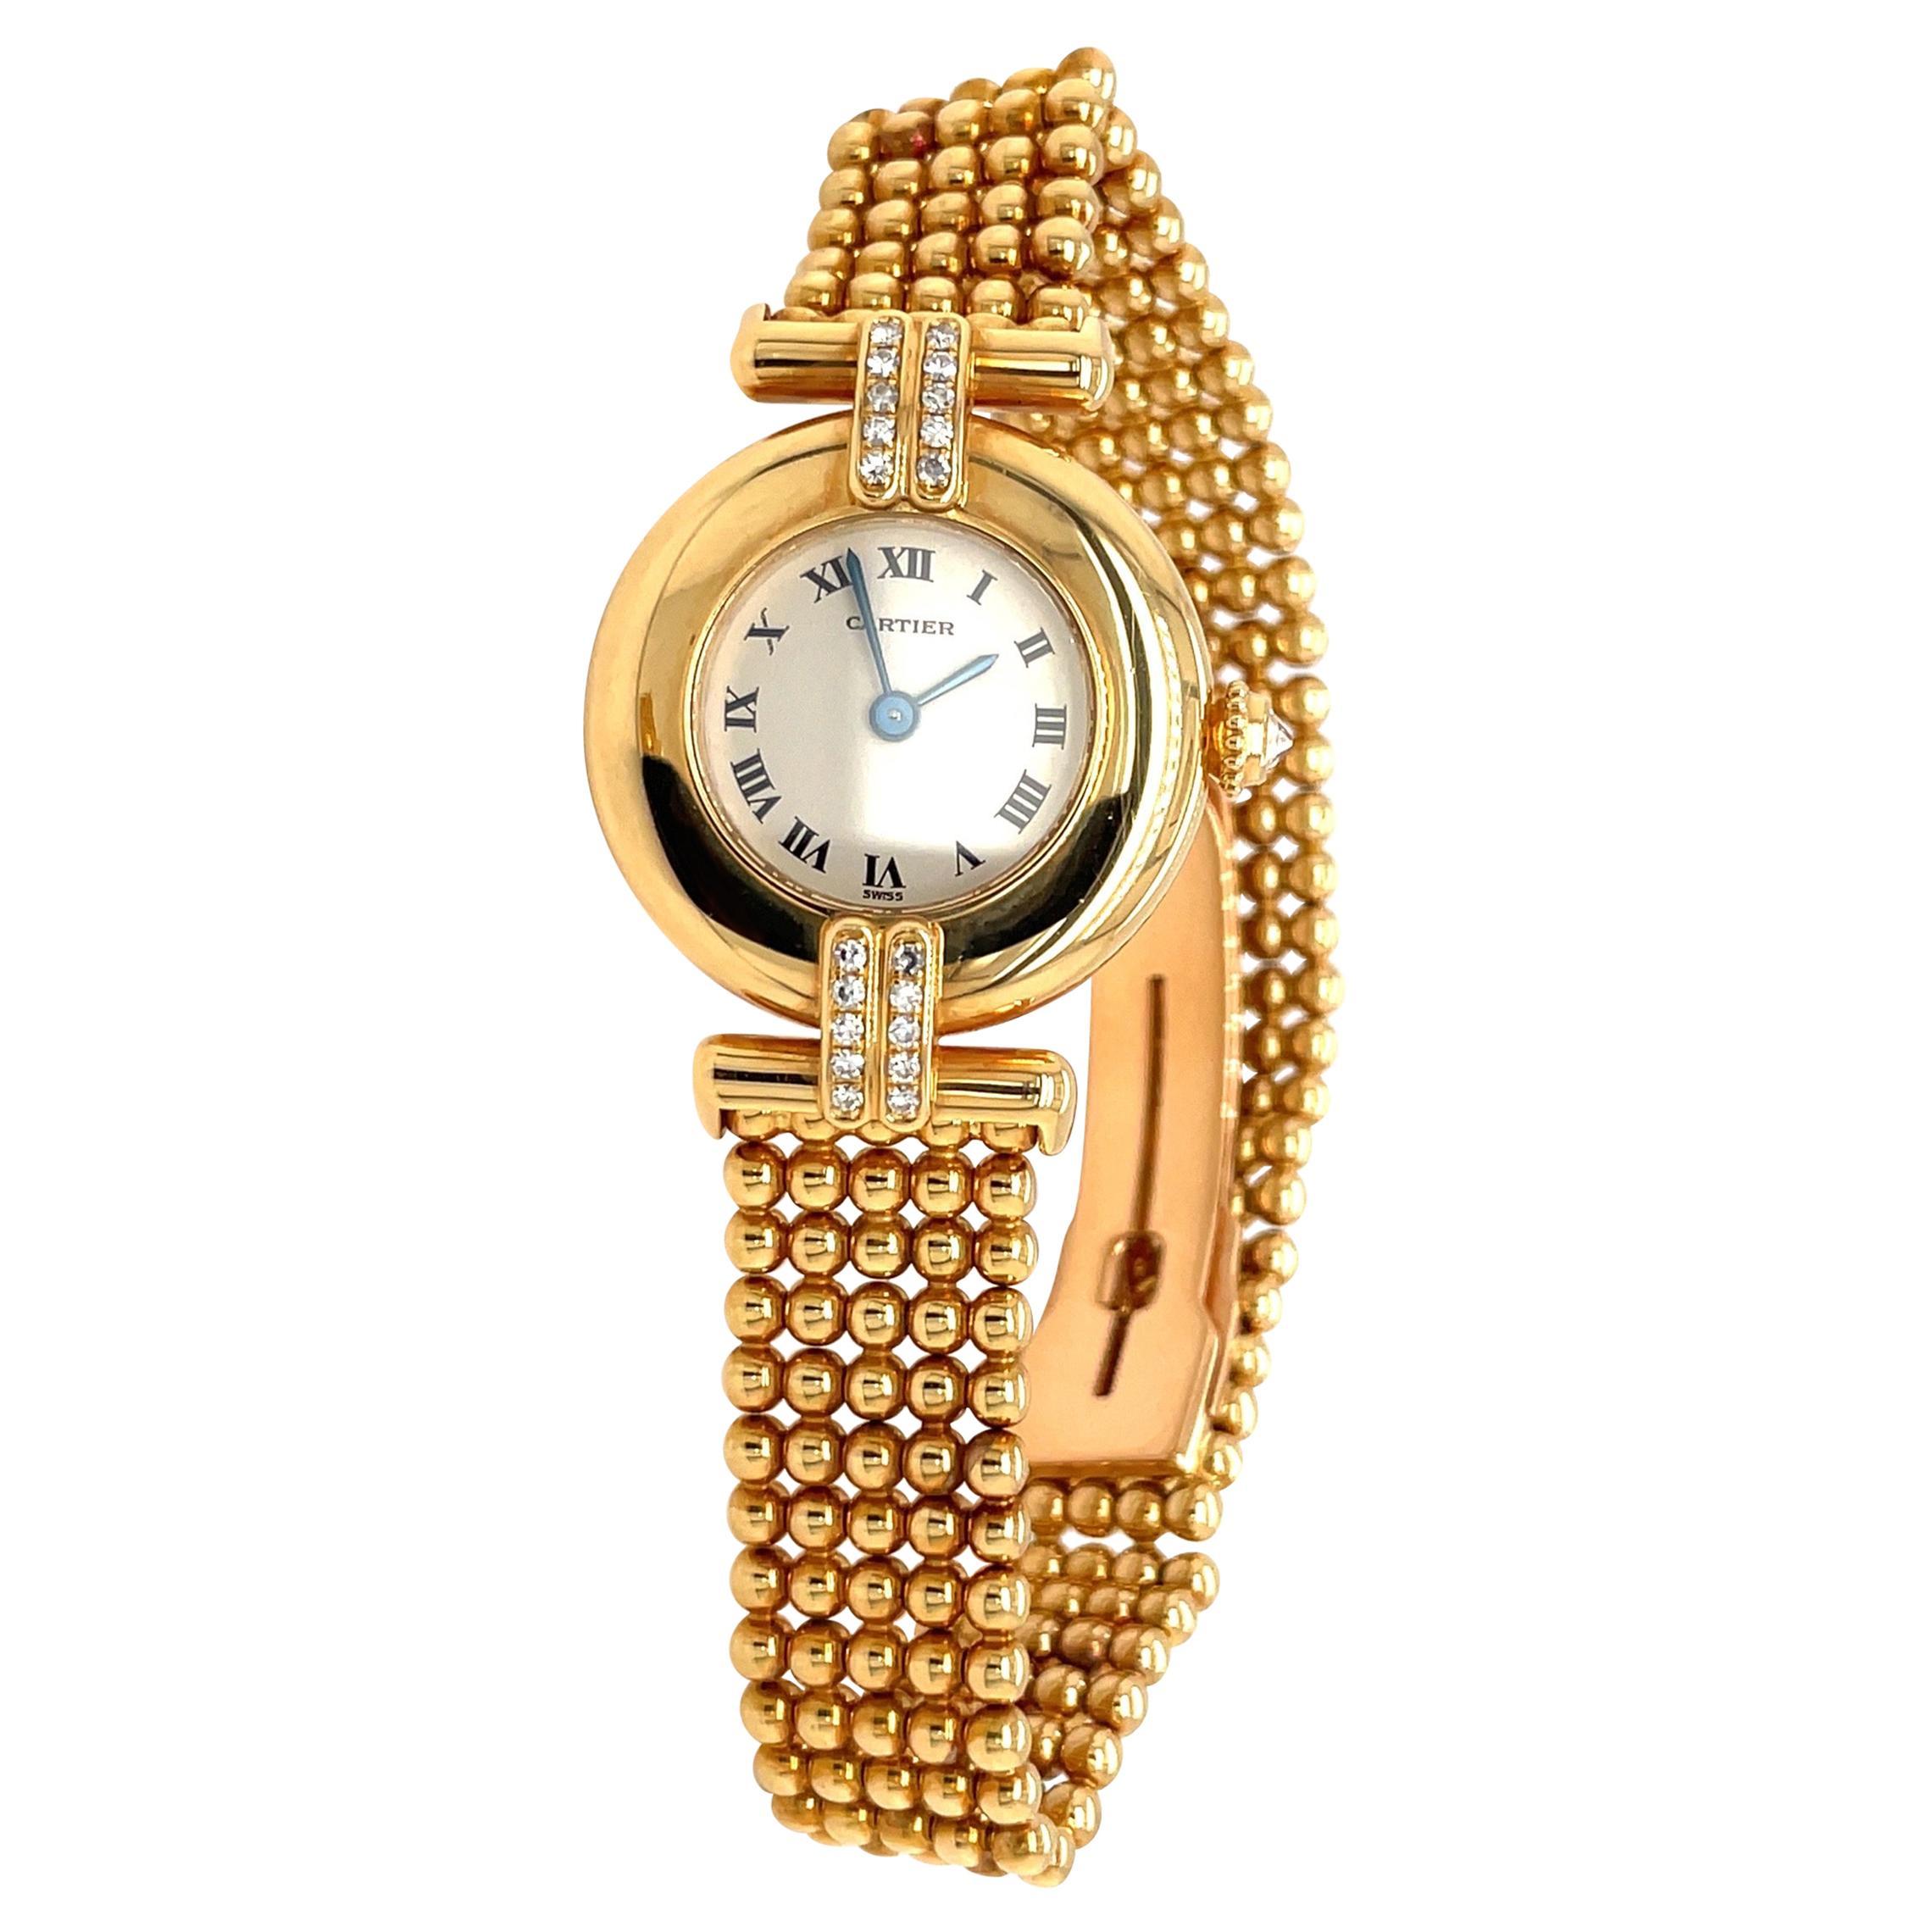 Cartier 18kt Yellow Gold Colisee Bracelet Watch